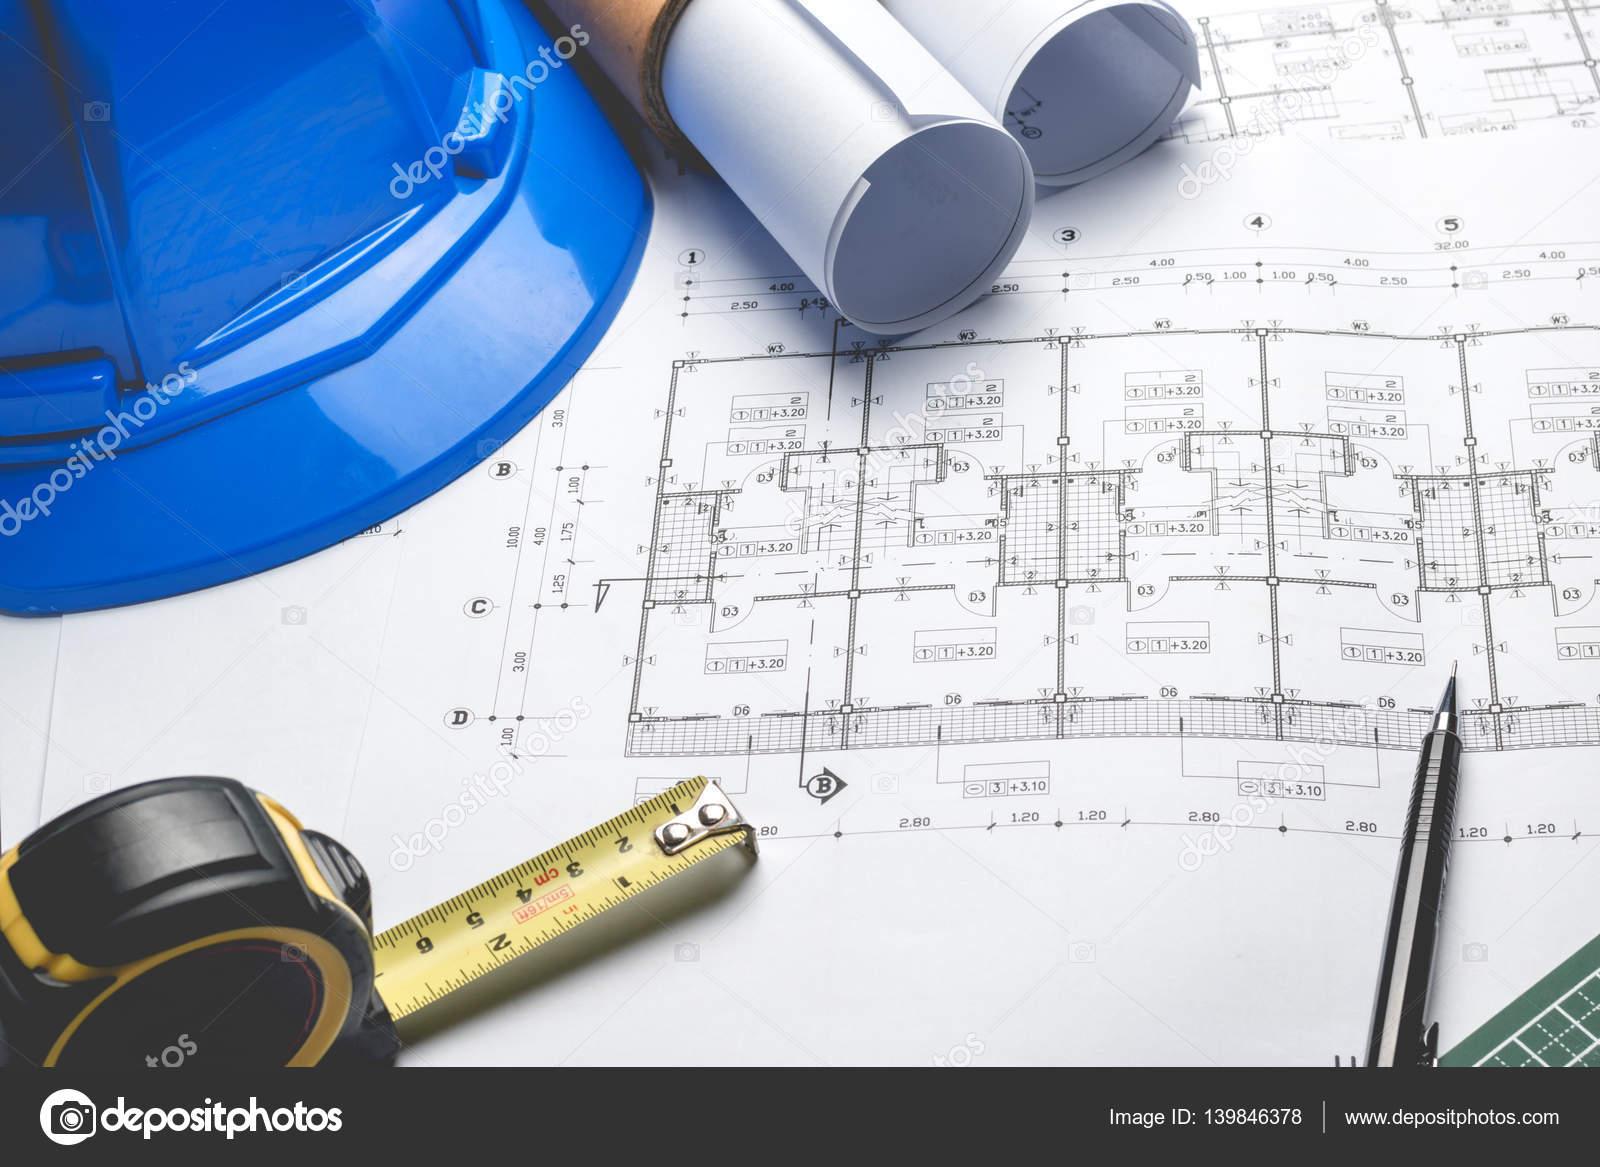 Engineering diagram blueprint paper drafting project stock photo engineering diagram blueprint paper drafting project stock photo malvernweather Choice Image